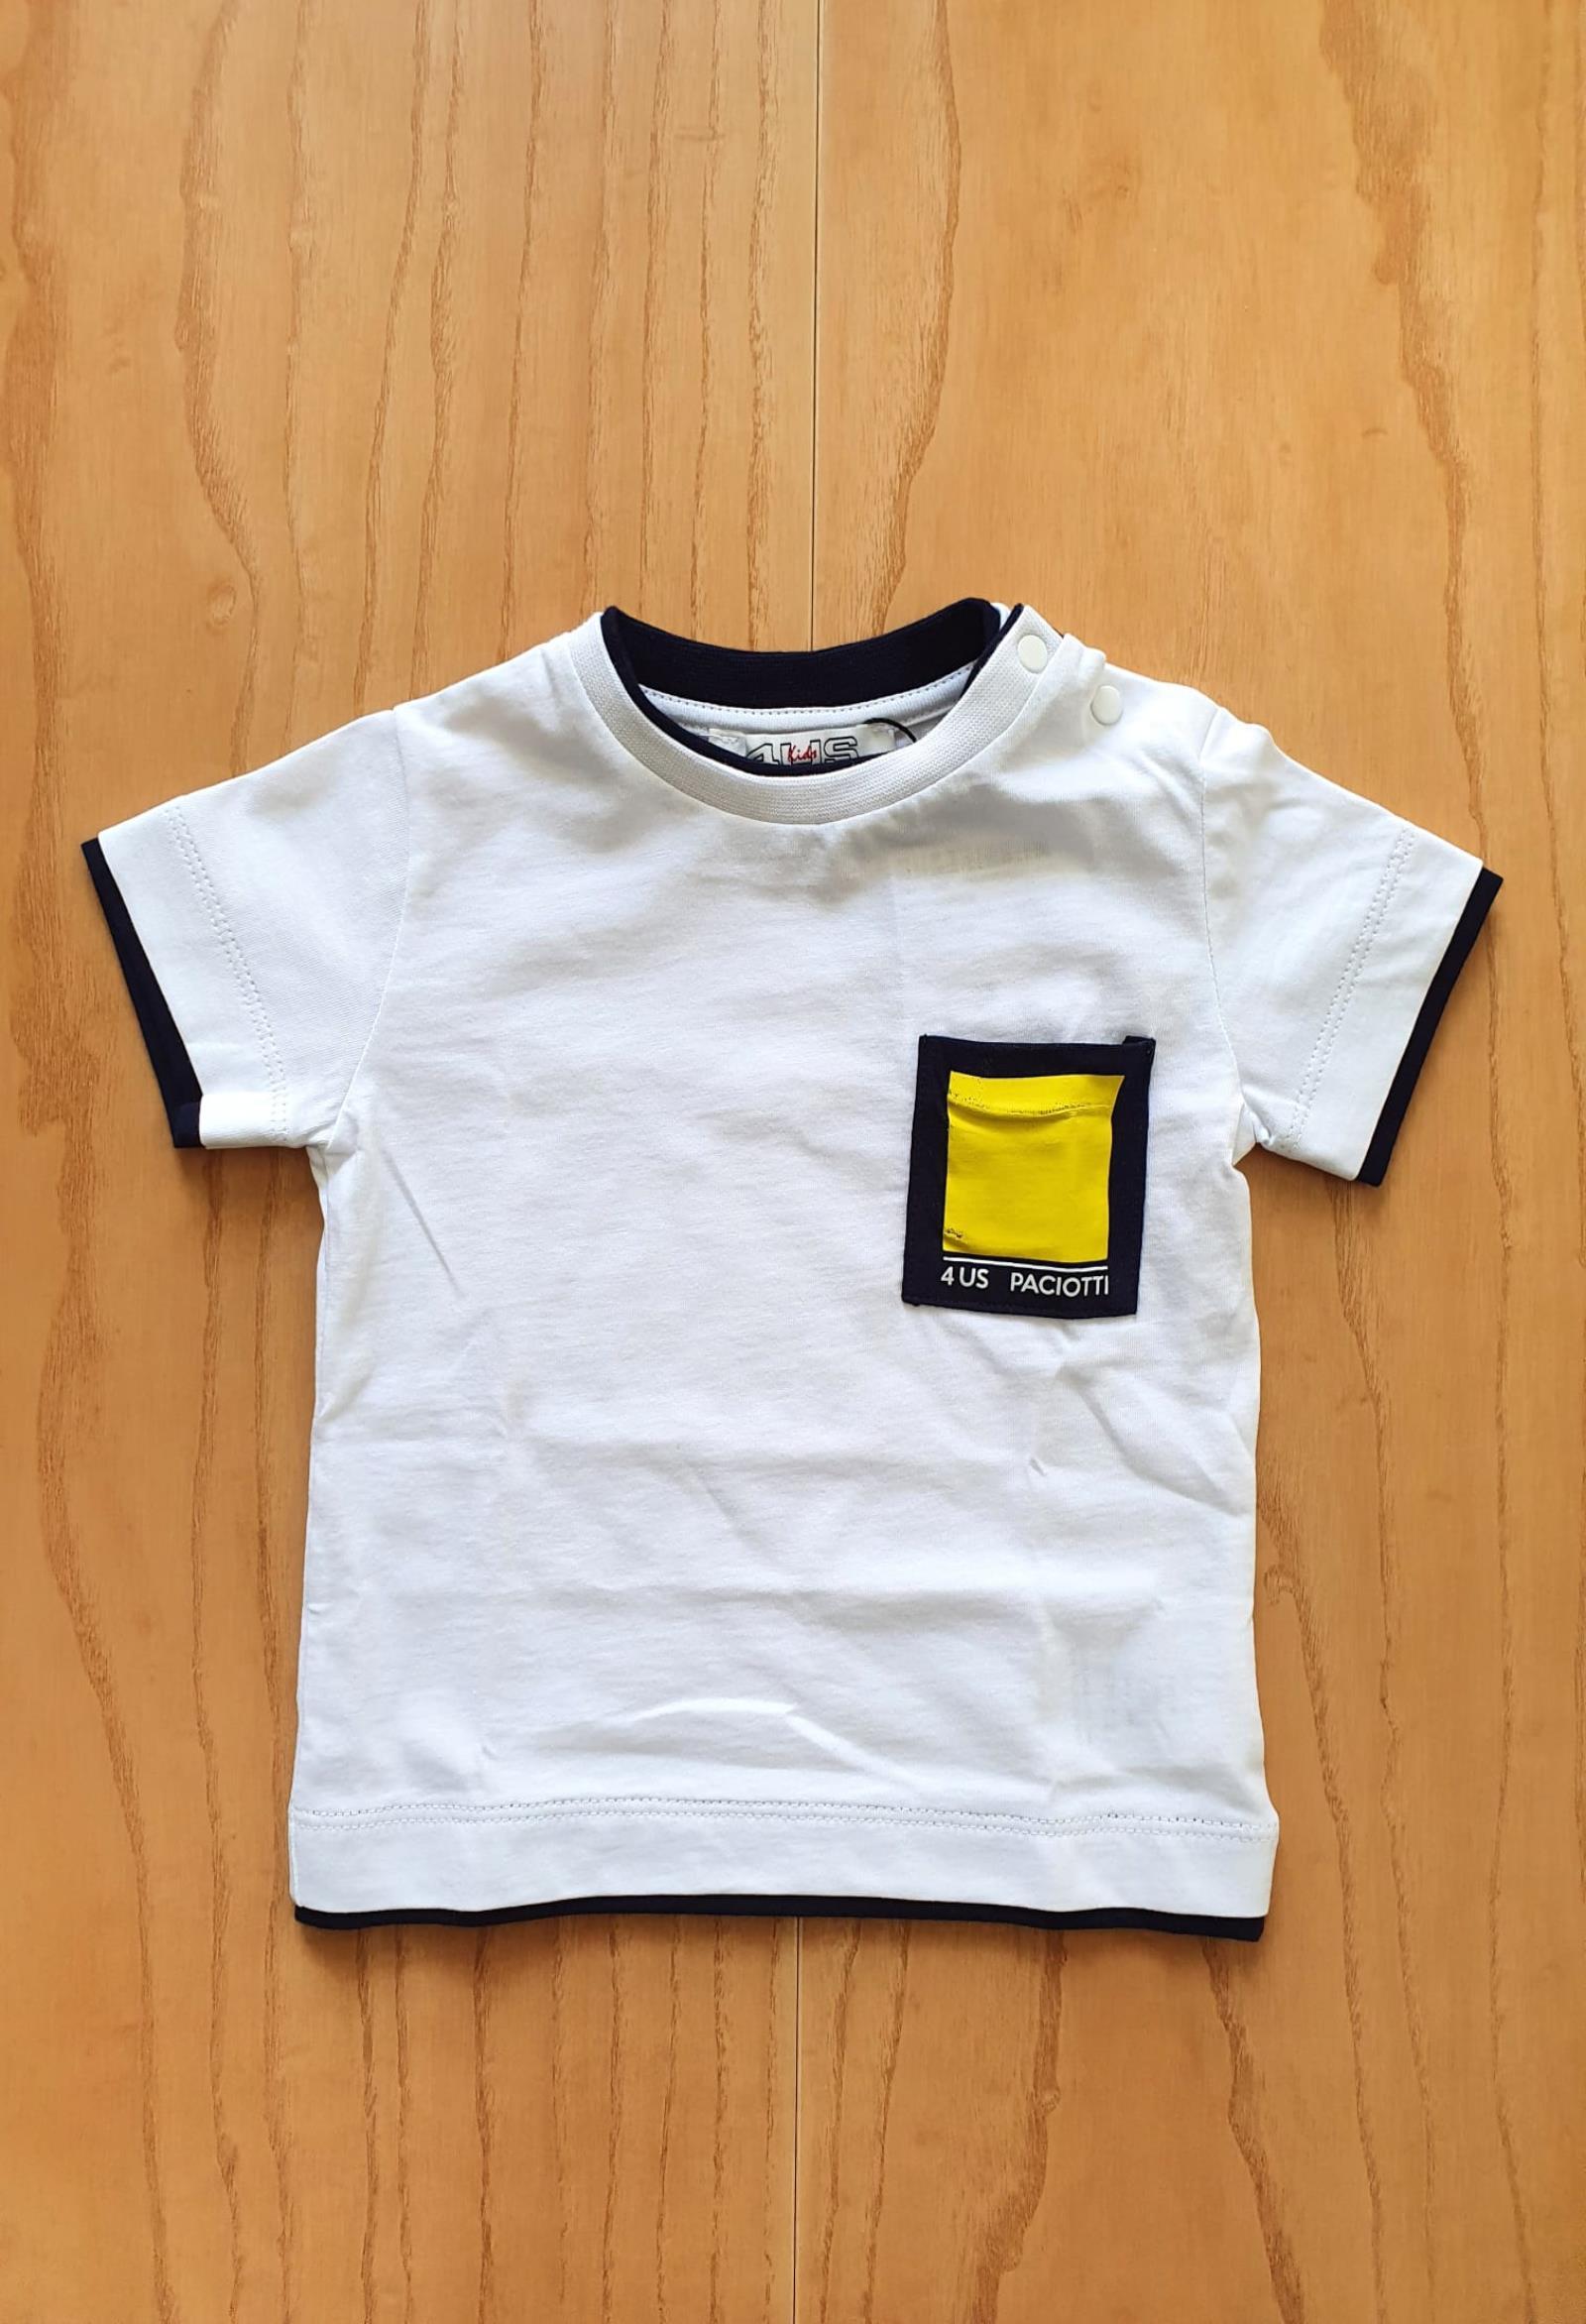 T-SHIRT BIANCA CON TASCHINO FRONTALE GIALLO cesare paciotti   T-shirt   TSP1144BUNI